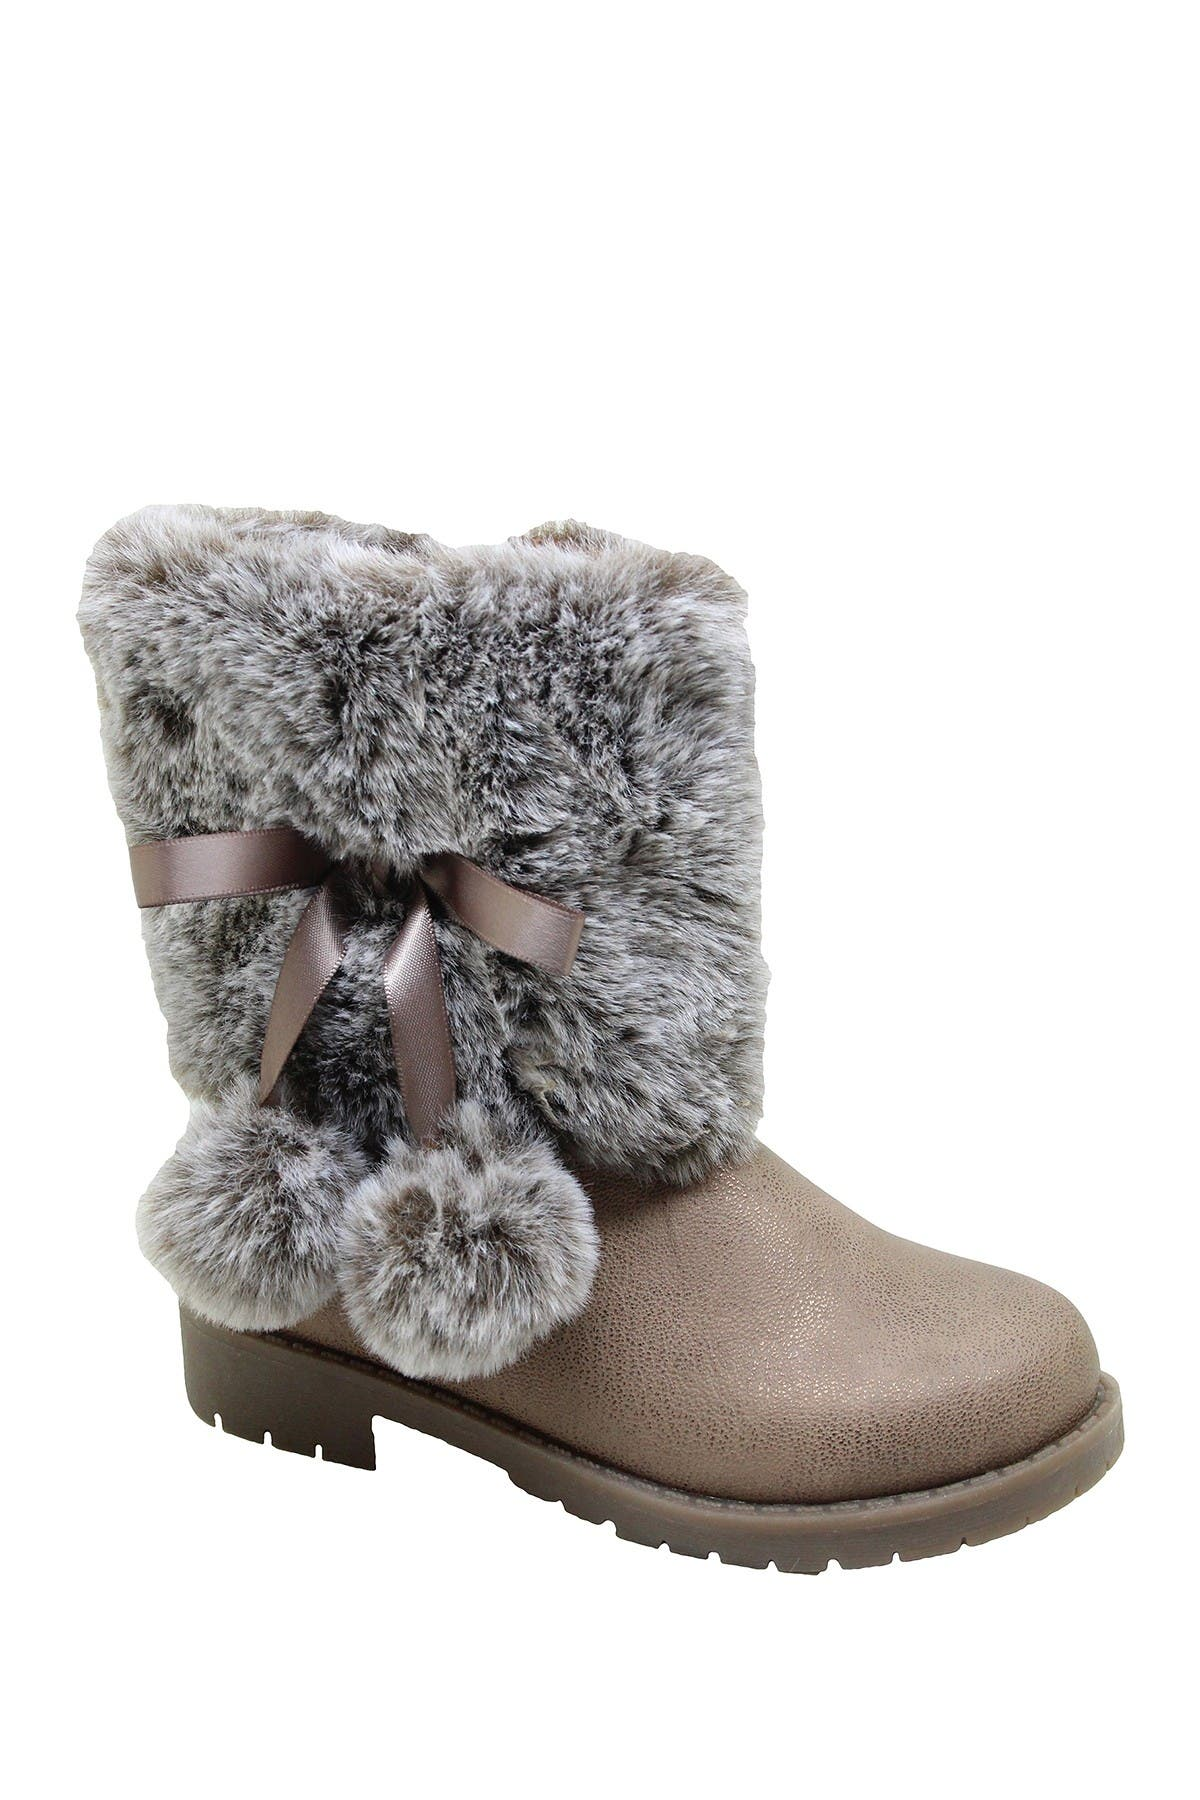 Image of Nicole Miller Faux Fur Trimmed Pompom Boot